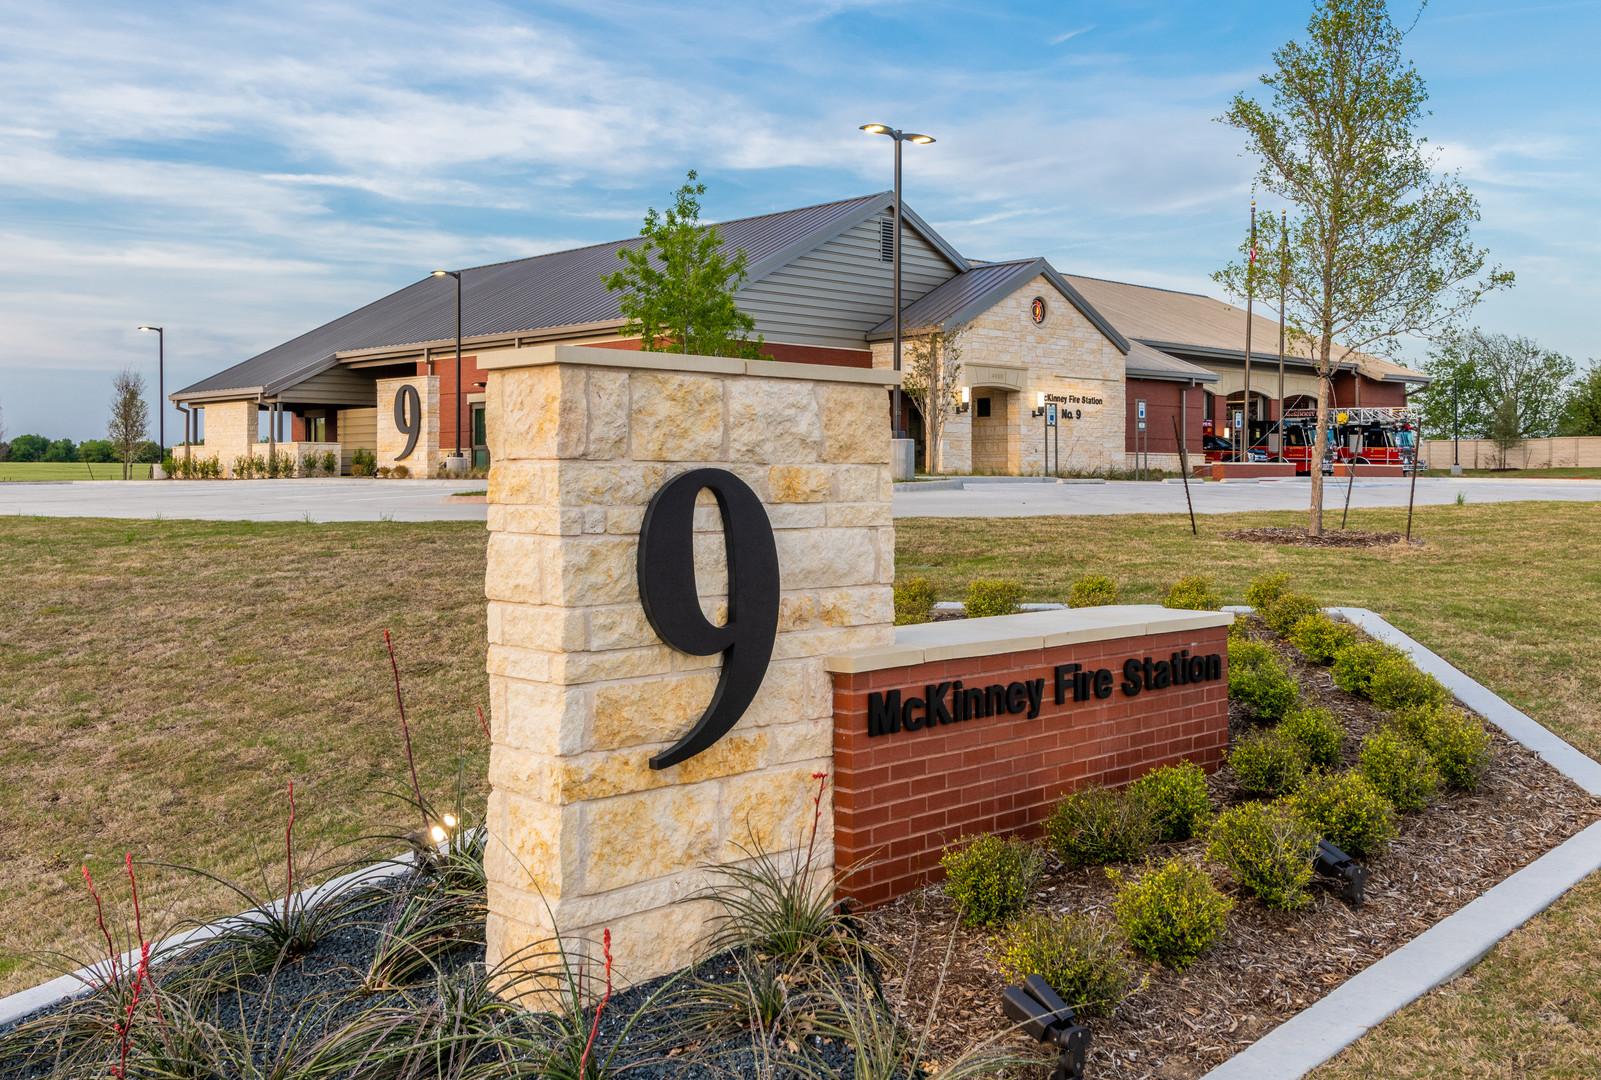 Mckinney Fire Station No. 9